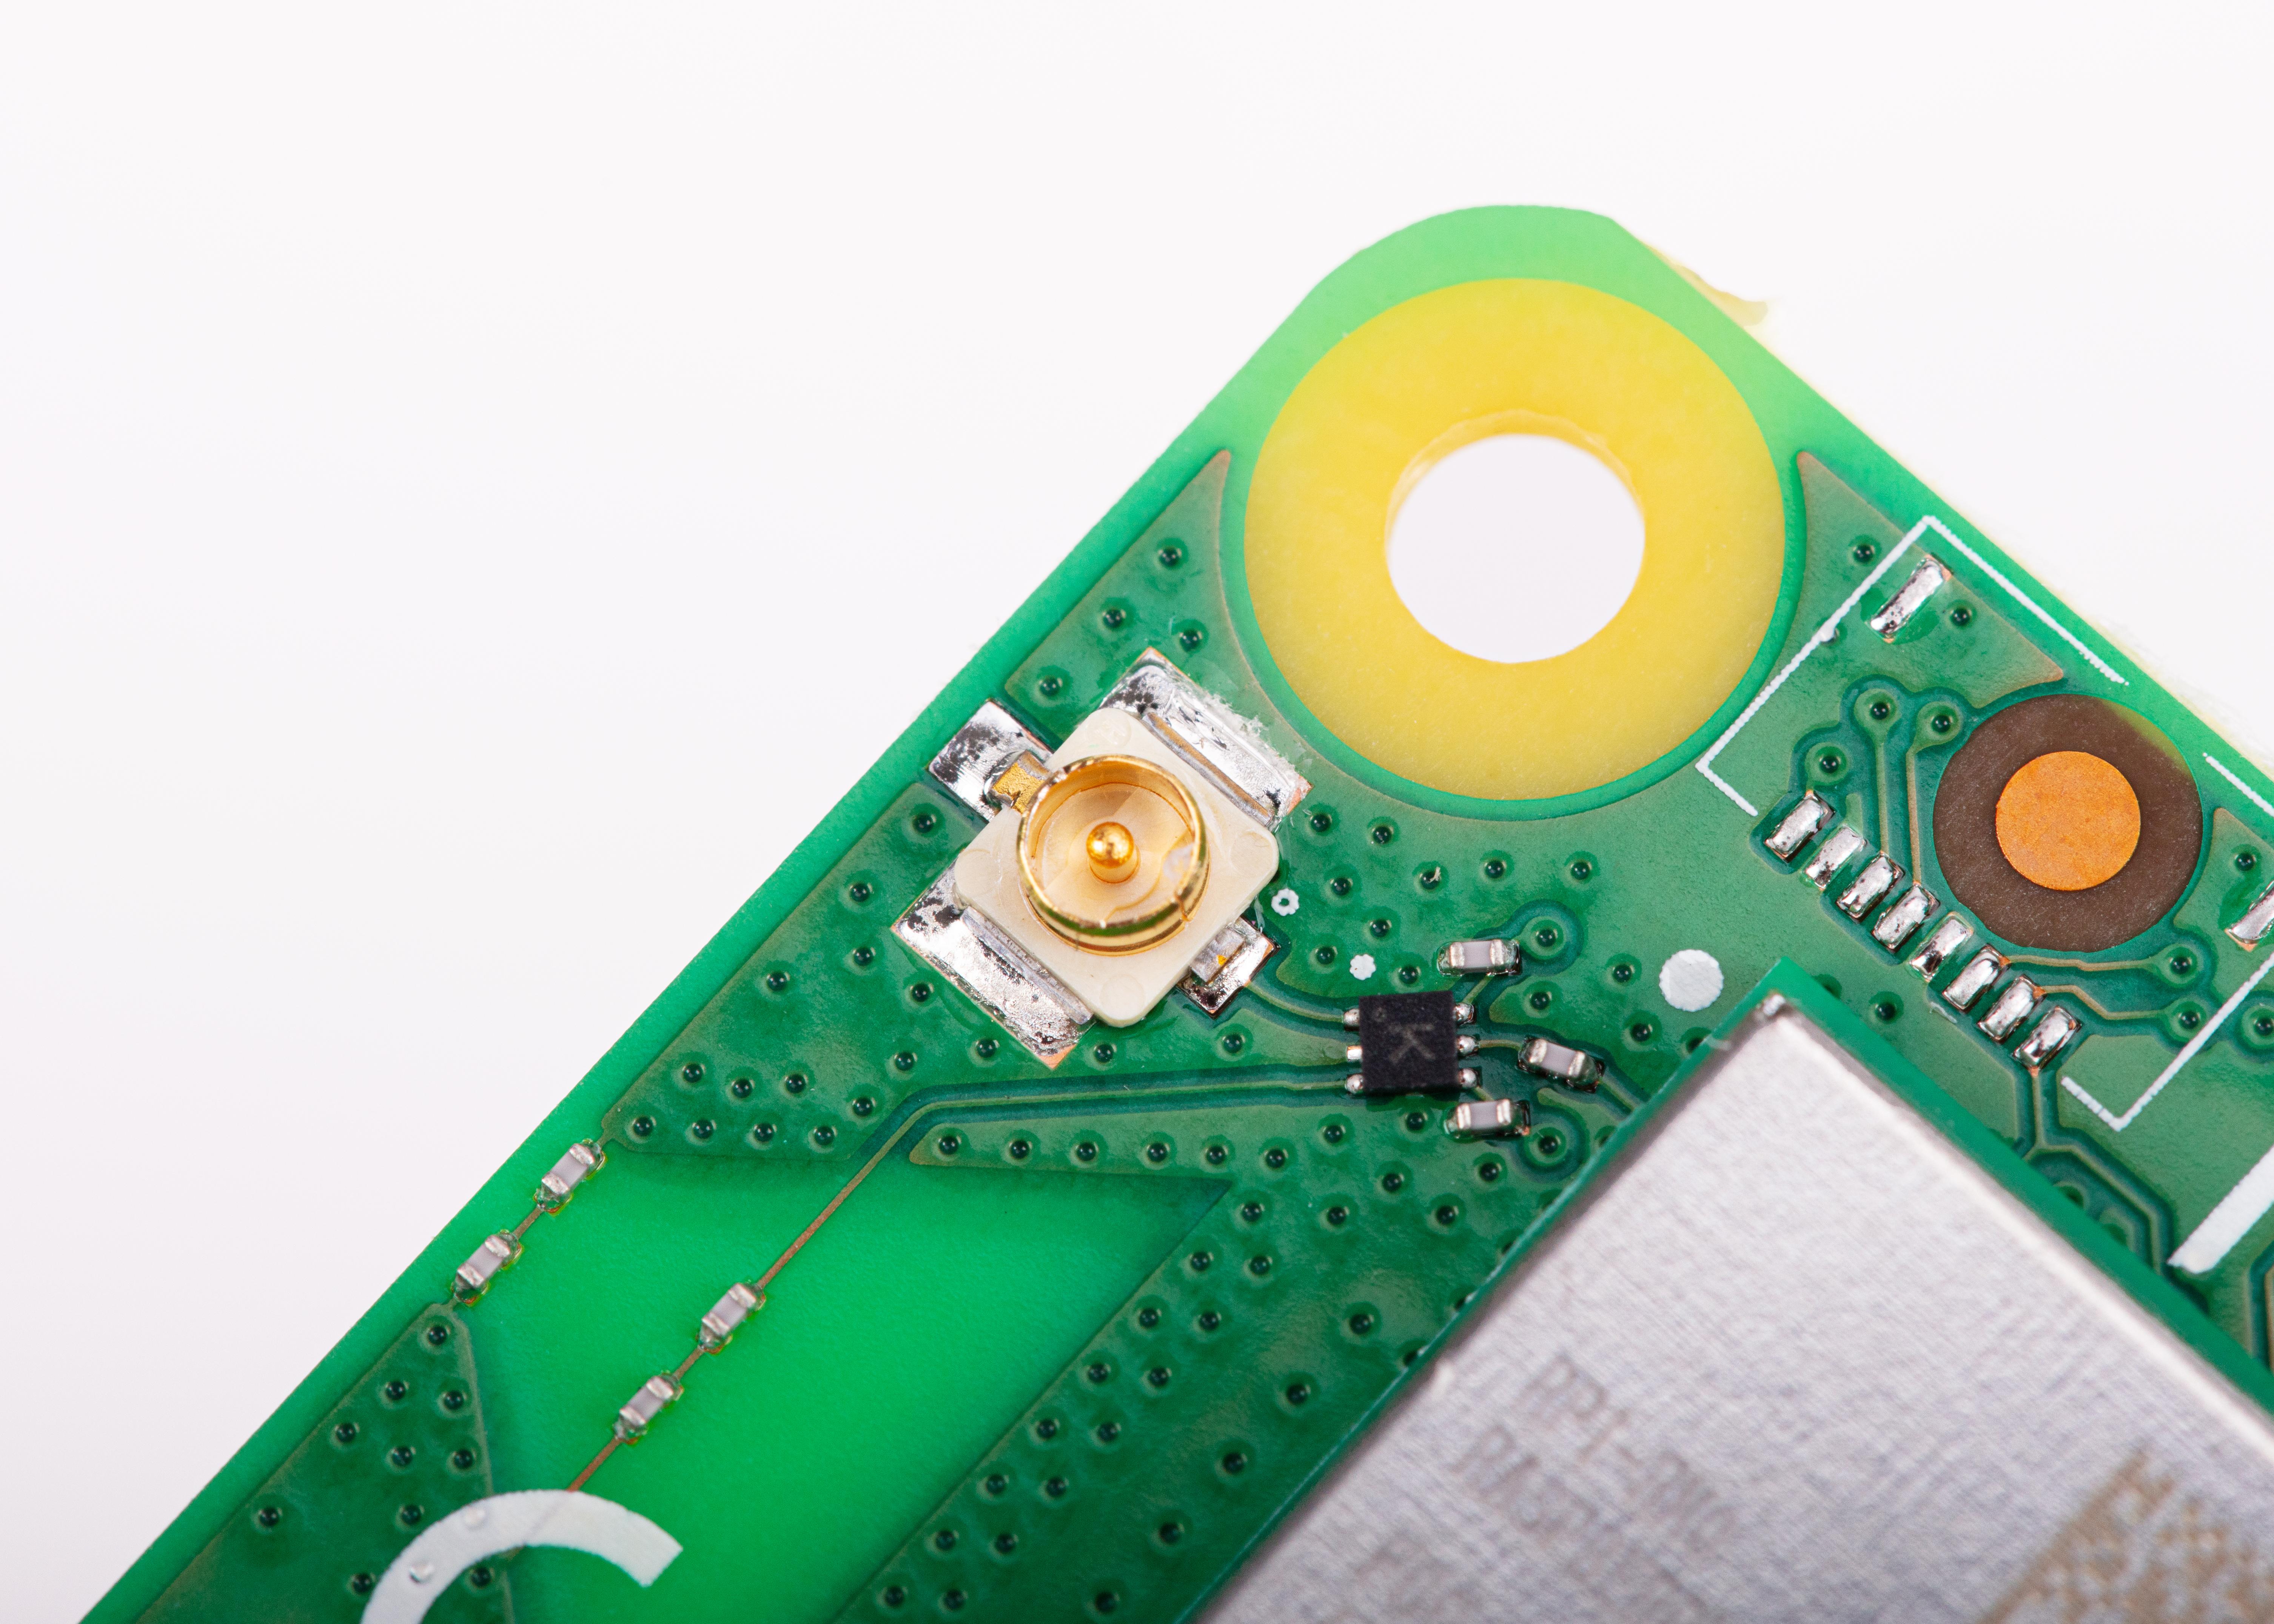 Raspberry Pi CM4 Antenna Kit